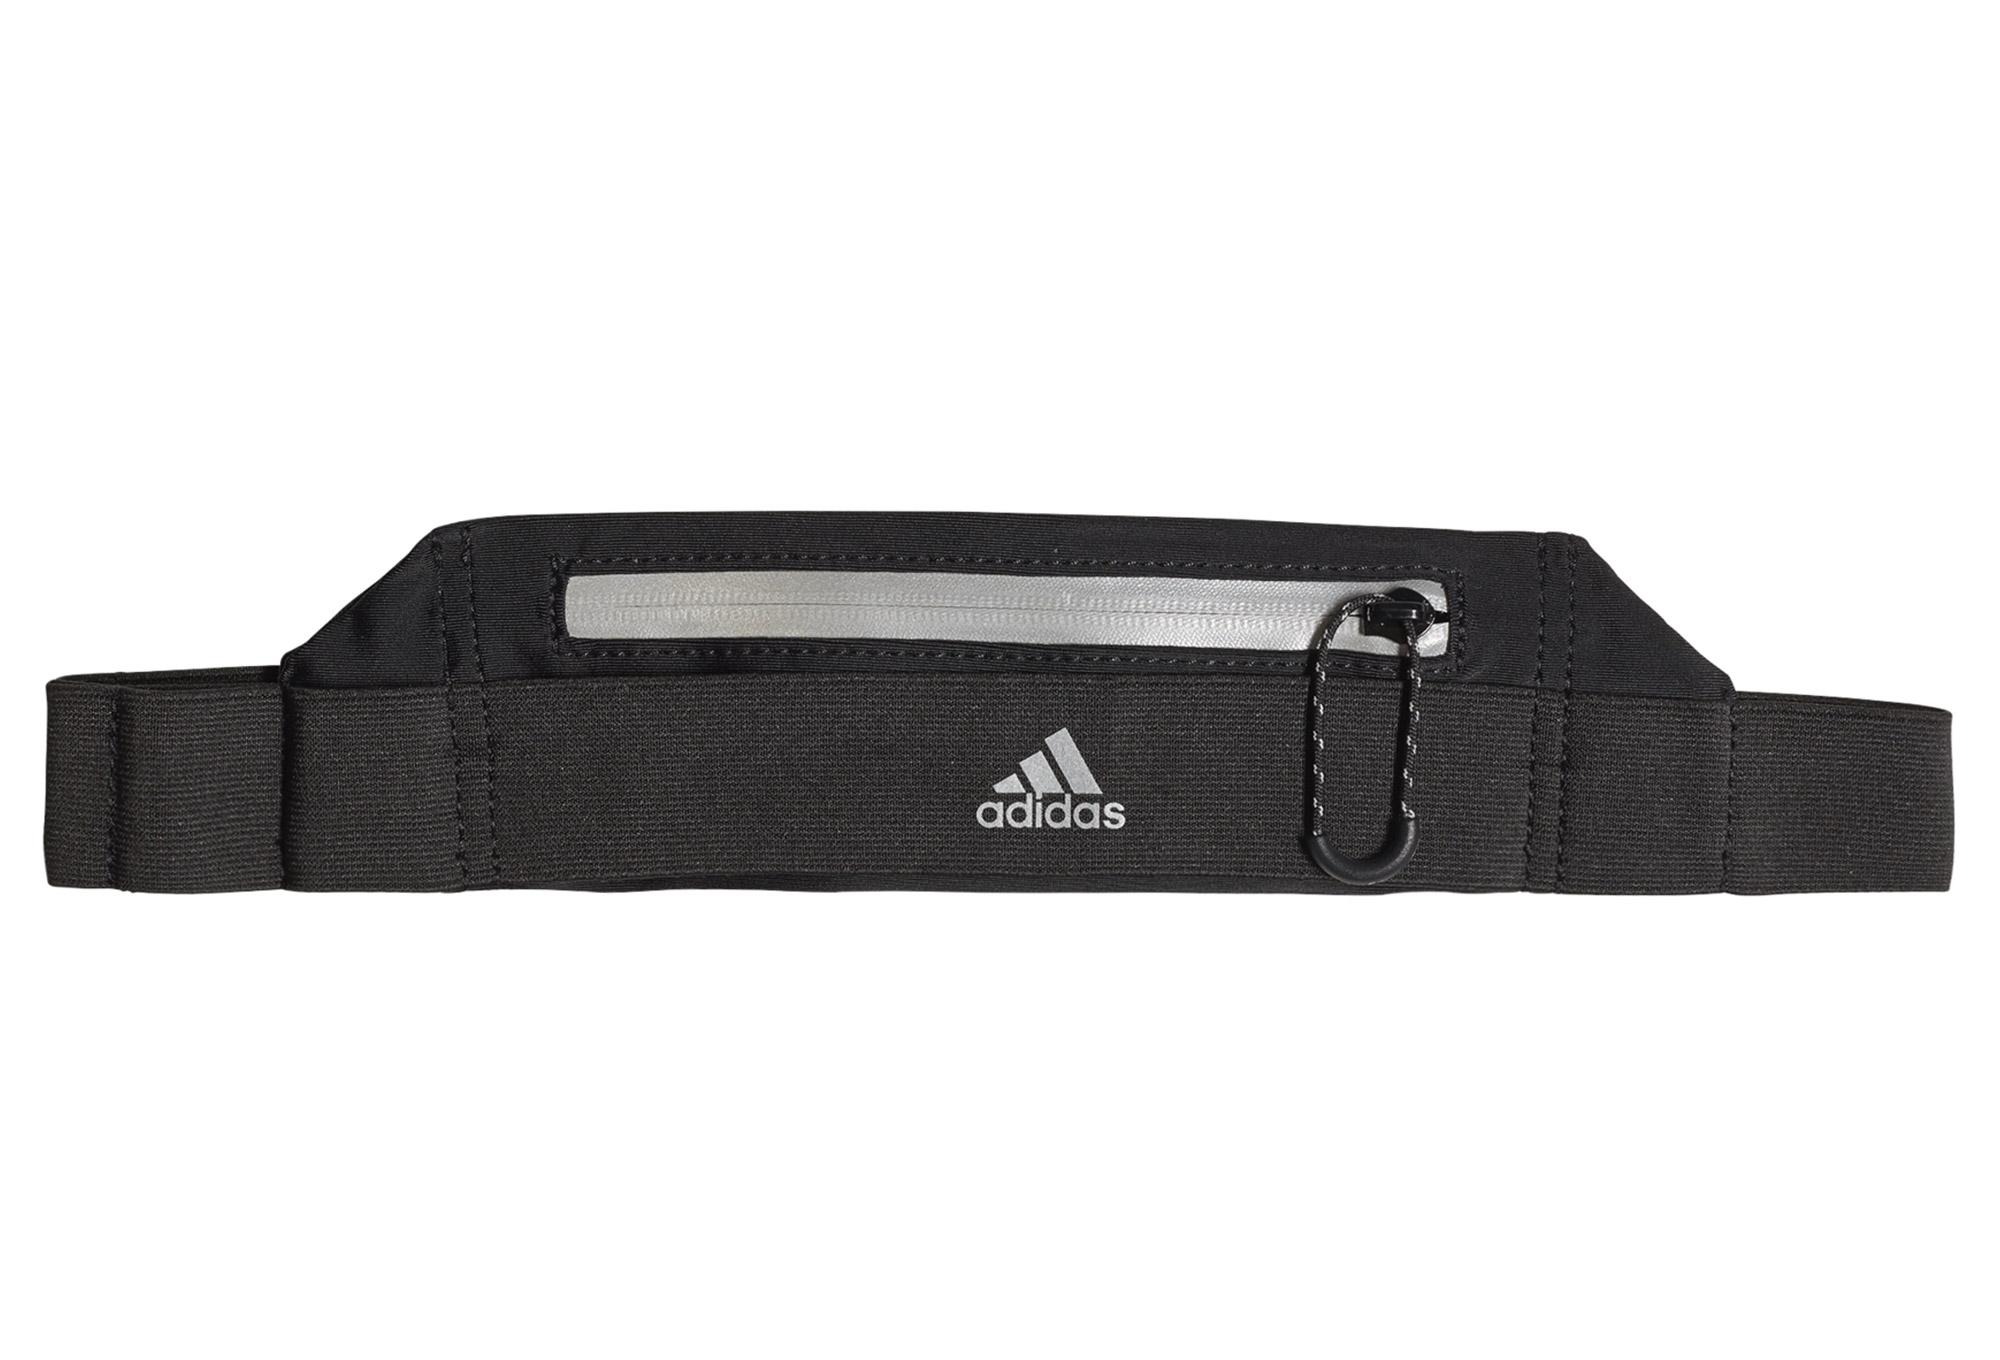 adidas running Run Belt Black   Alltricks.com 174d59de1fc